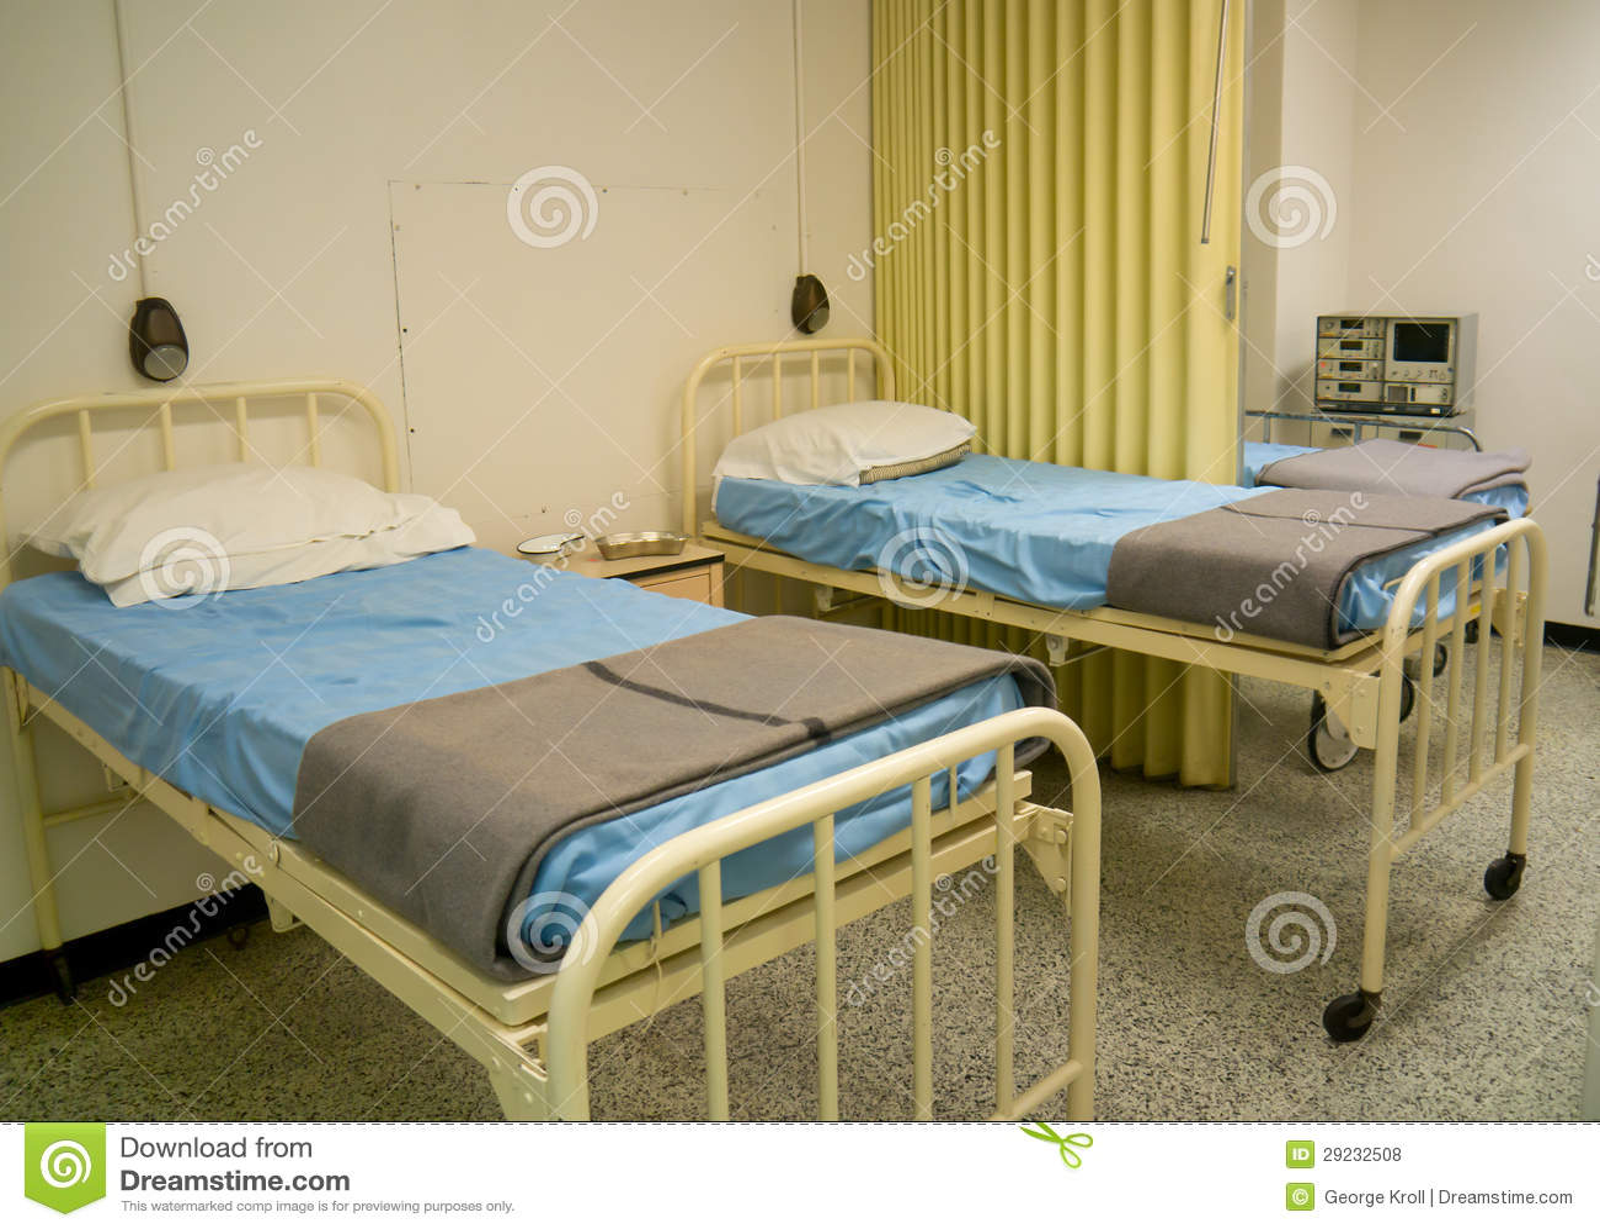 Military style hospital beds. Military Style Hospital Beds Stock Photo   Image  29232508